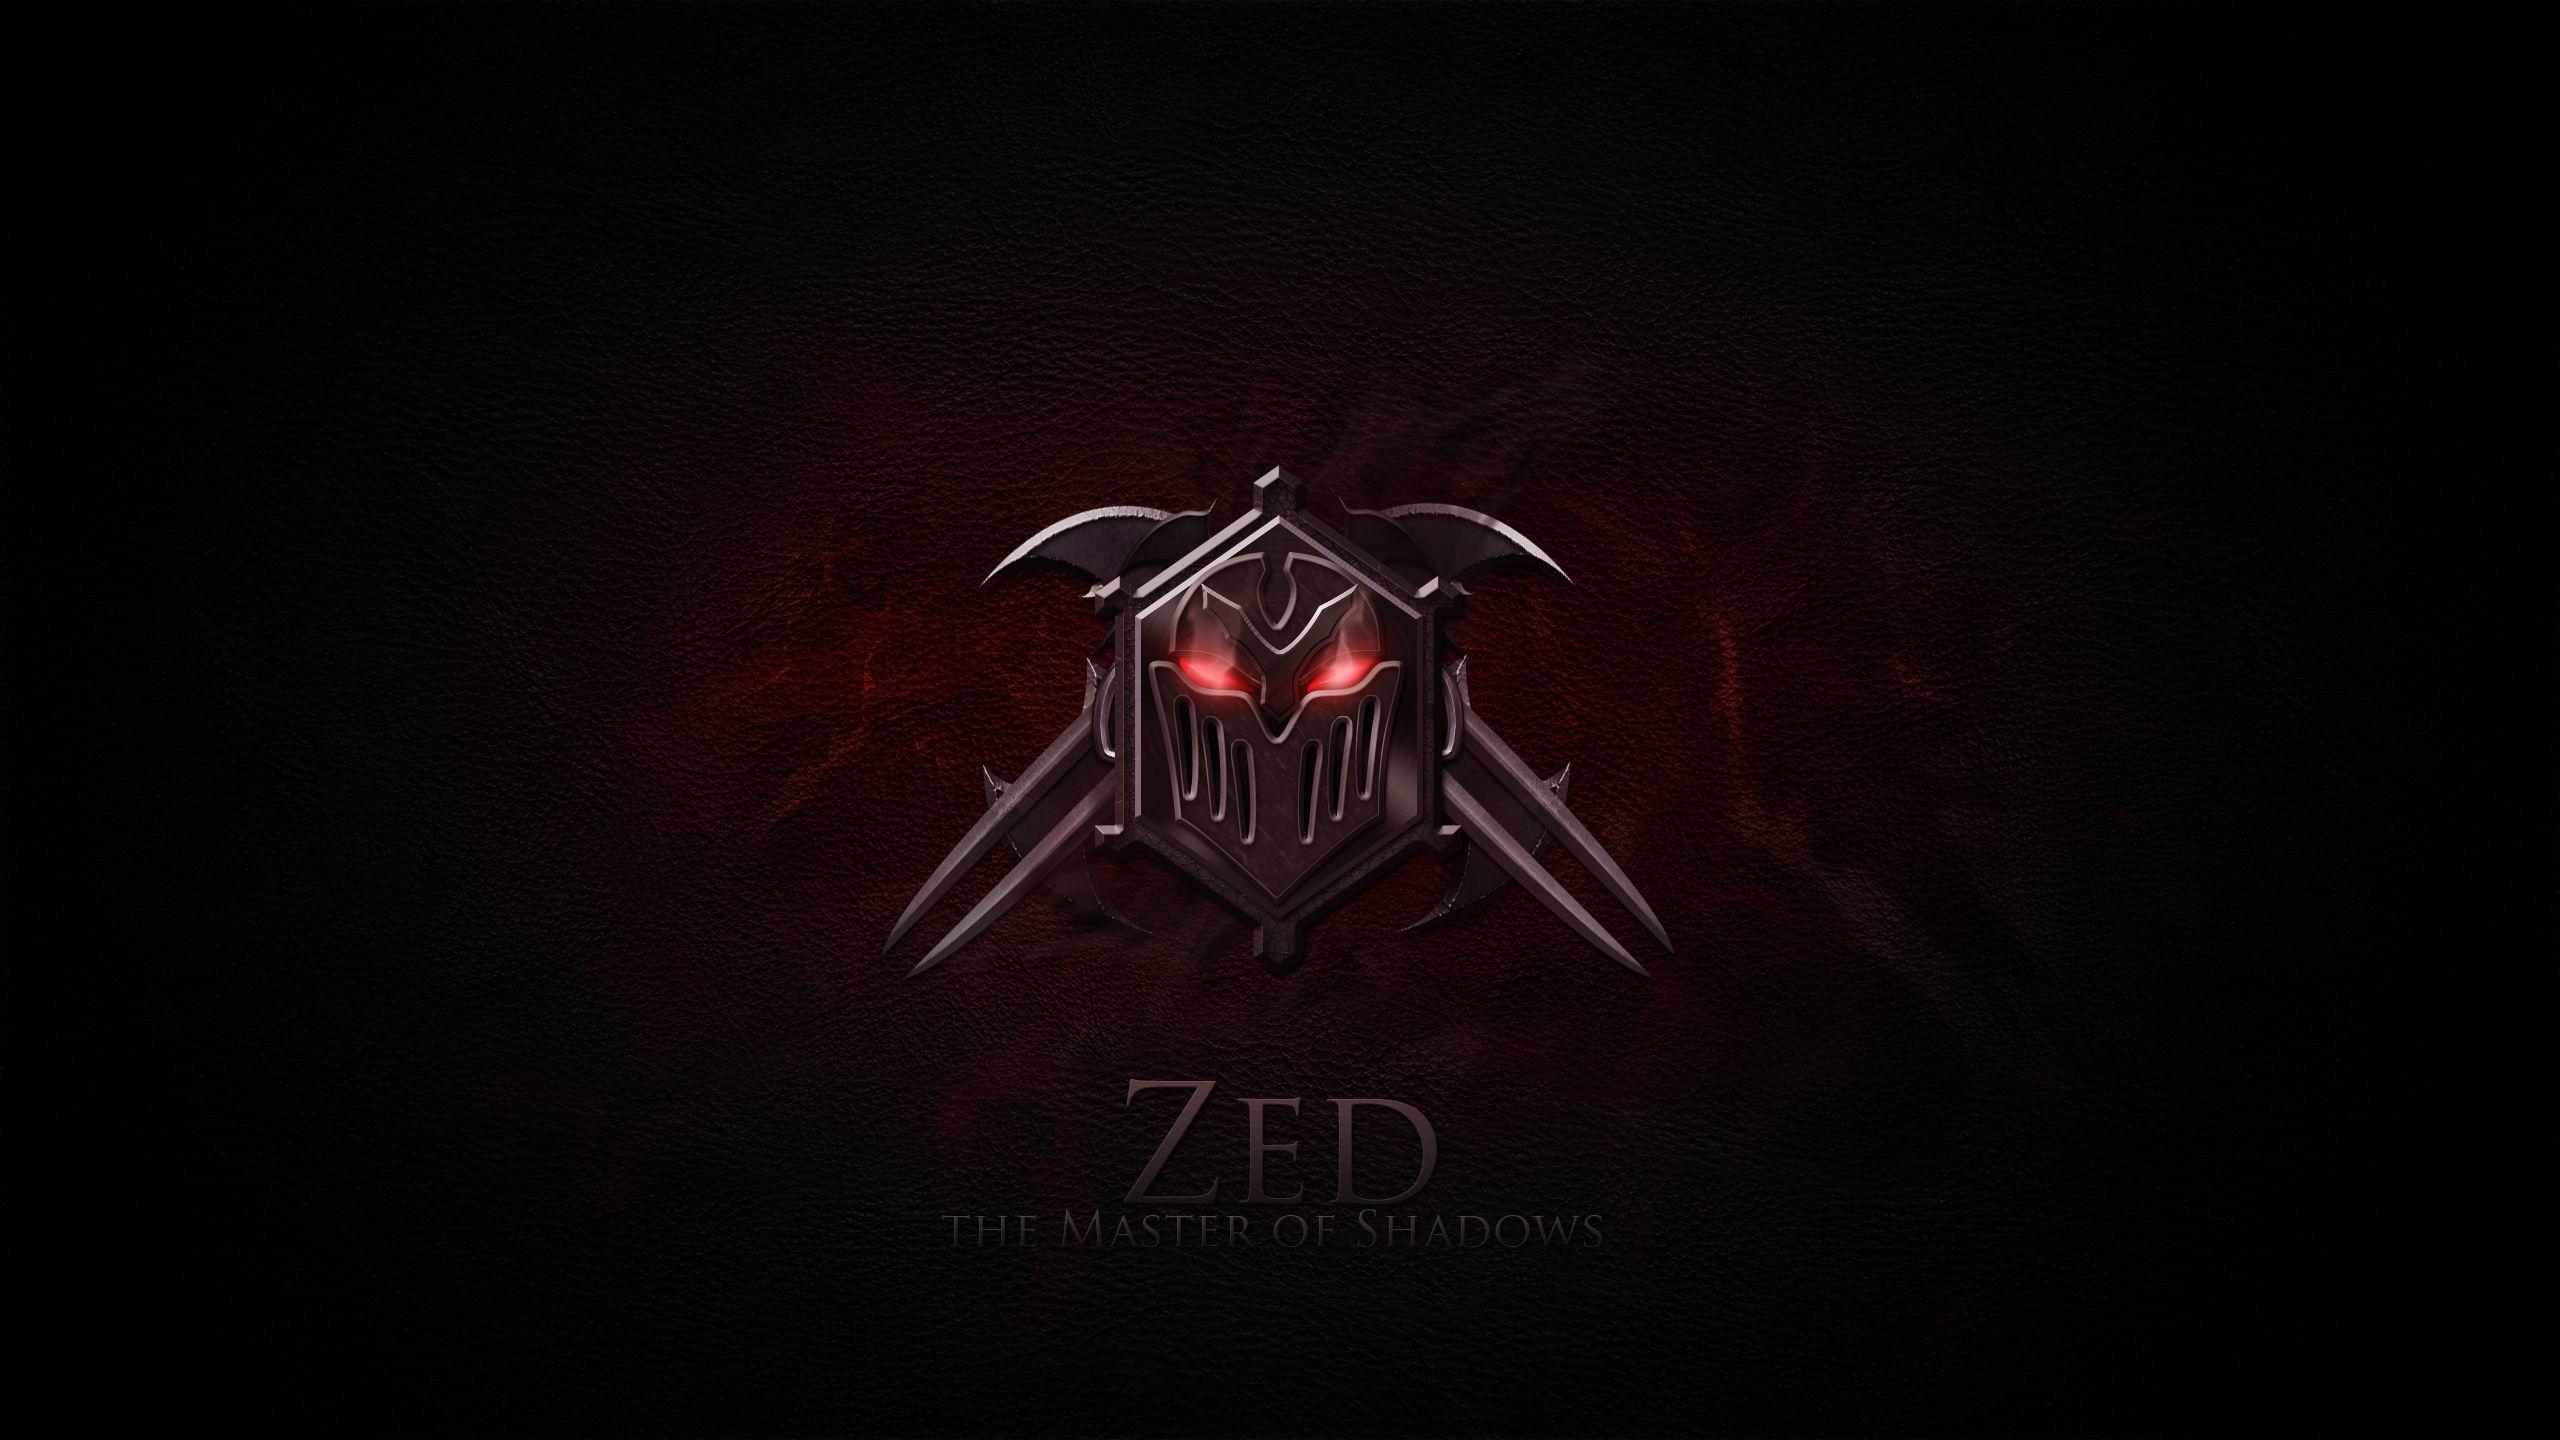 Zed League Of Legends Wallpapers HD 1920x1080 League Of